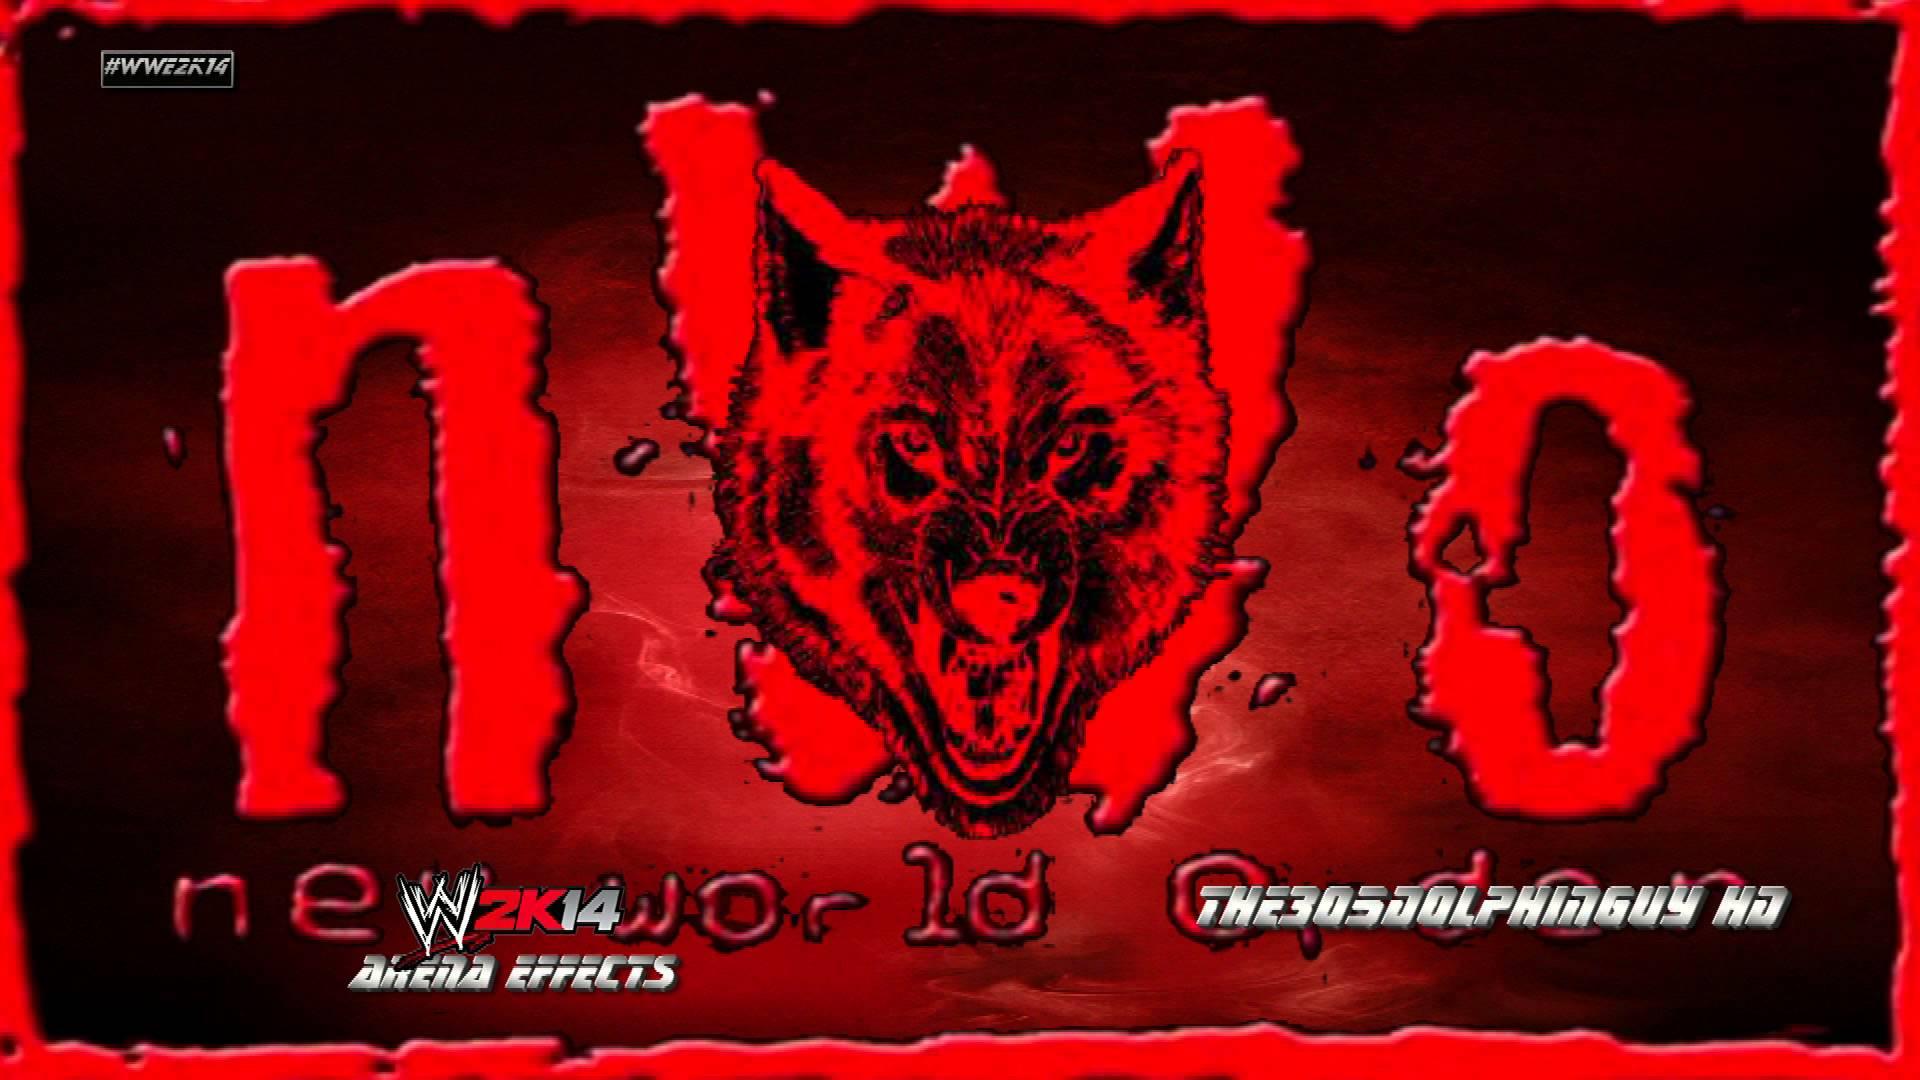 WWE 2K14 nWo WolfpacnWo Elite 1st Theme   Wolfpac Theme HQ Arena 1920x1080